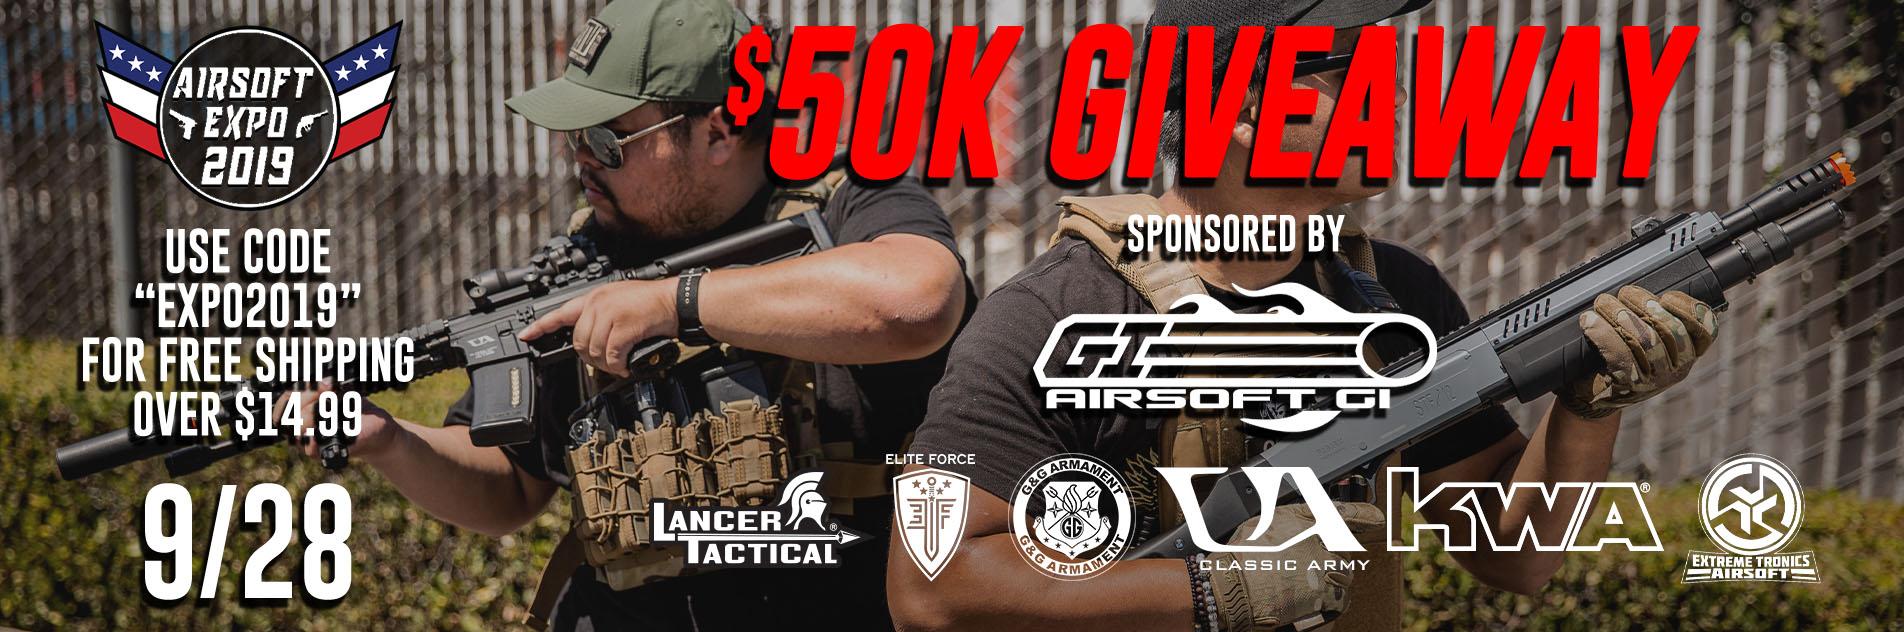 Airsoft GI | Airsoft is a recreational sport for guns